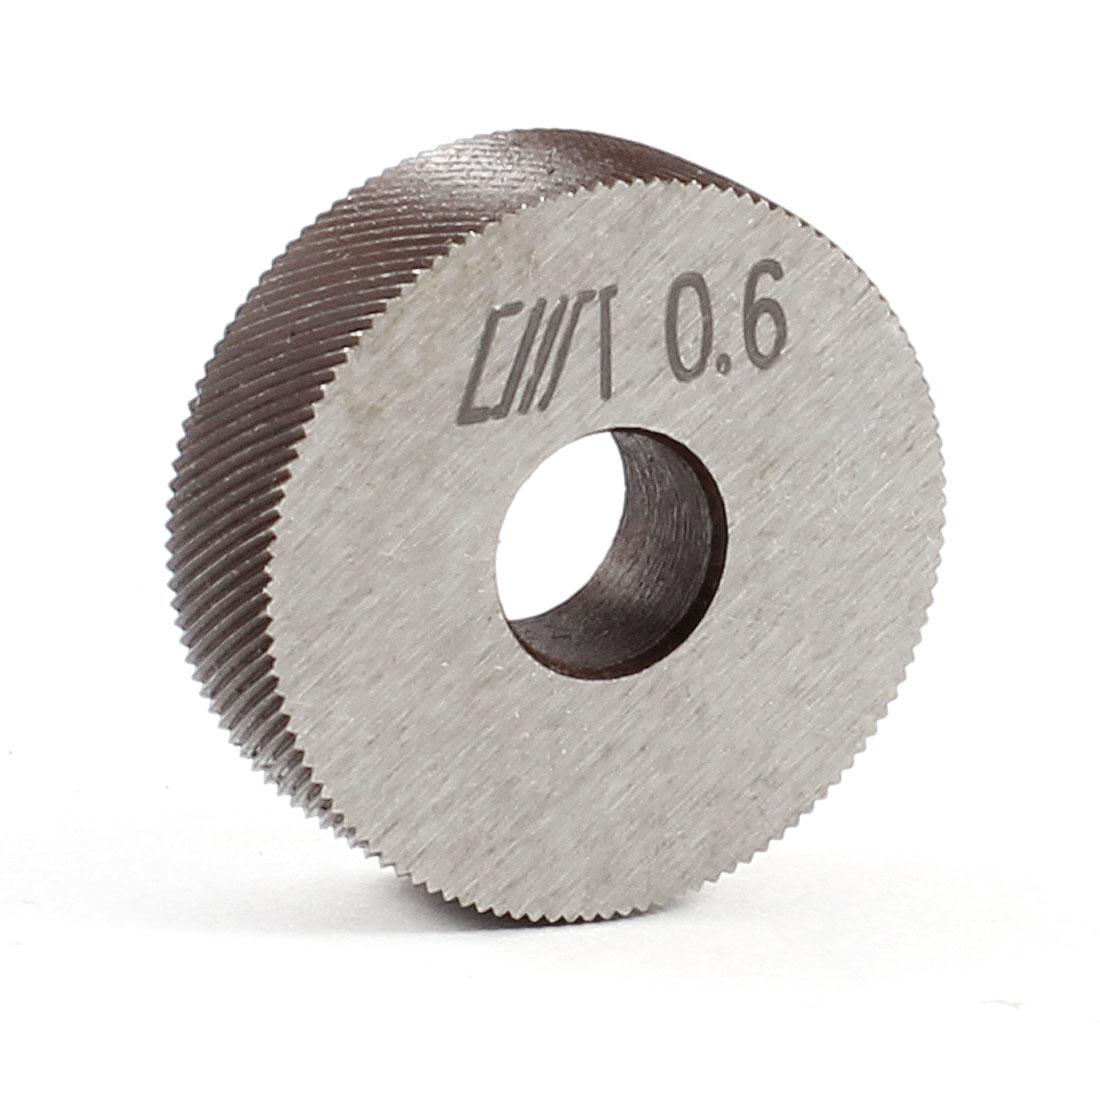 26mm x 8mm x 8mm HSS 0.6mm Pitch Diagonal Coarse Knurl Wheel Knurling Roller